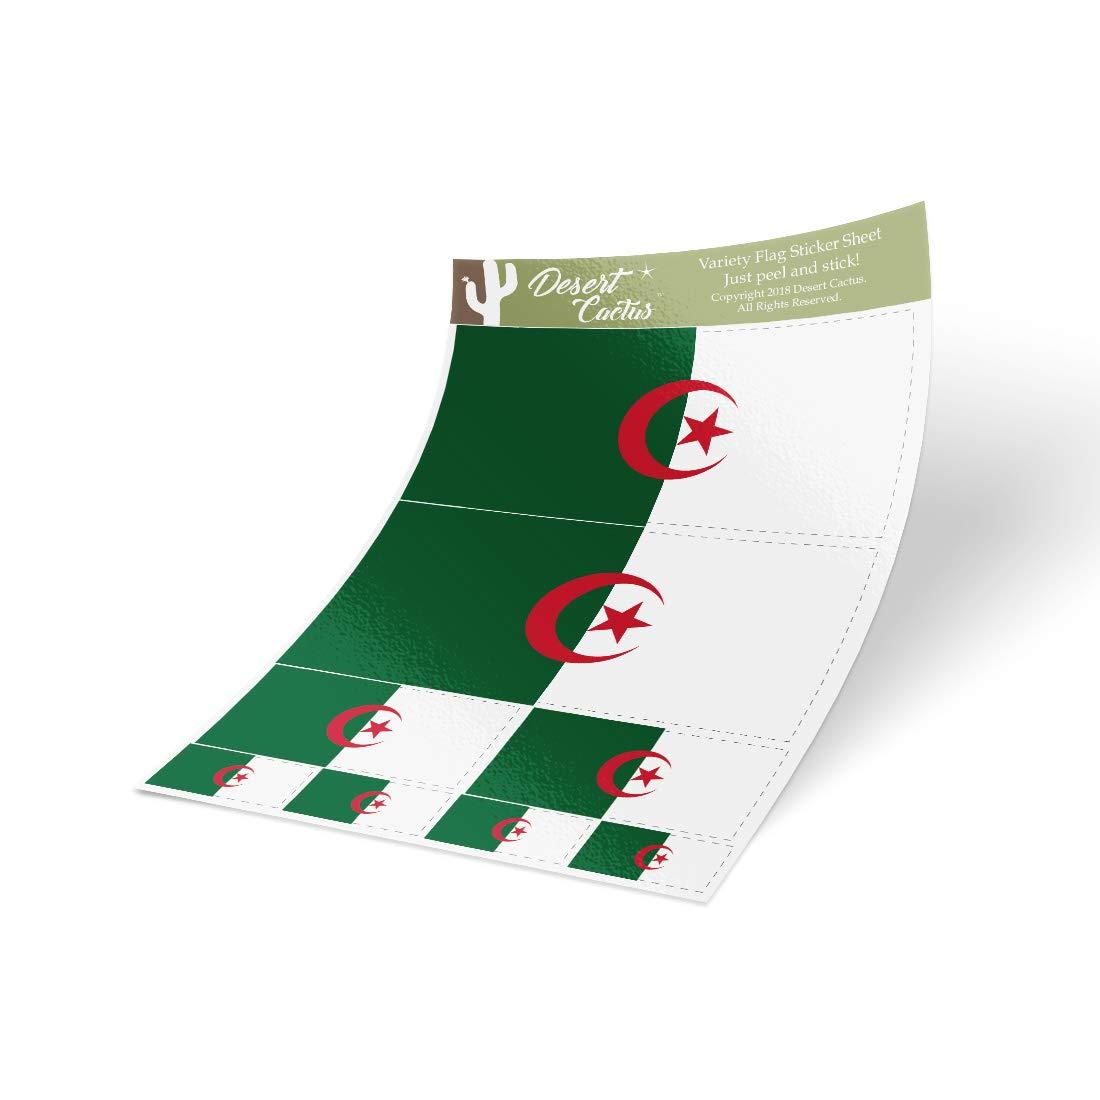 Desert Cactus Algeria Country Flag Sticker Decal Variety Size Pack 8 Total Pieces Kids Logo Scrapbook Car Vinyl Window Bumper Laptop Algerian V